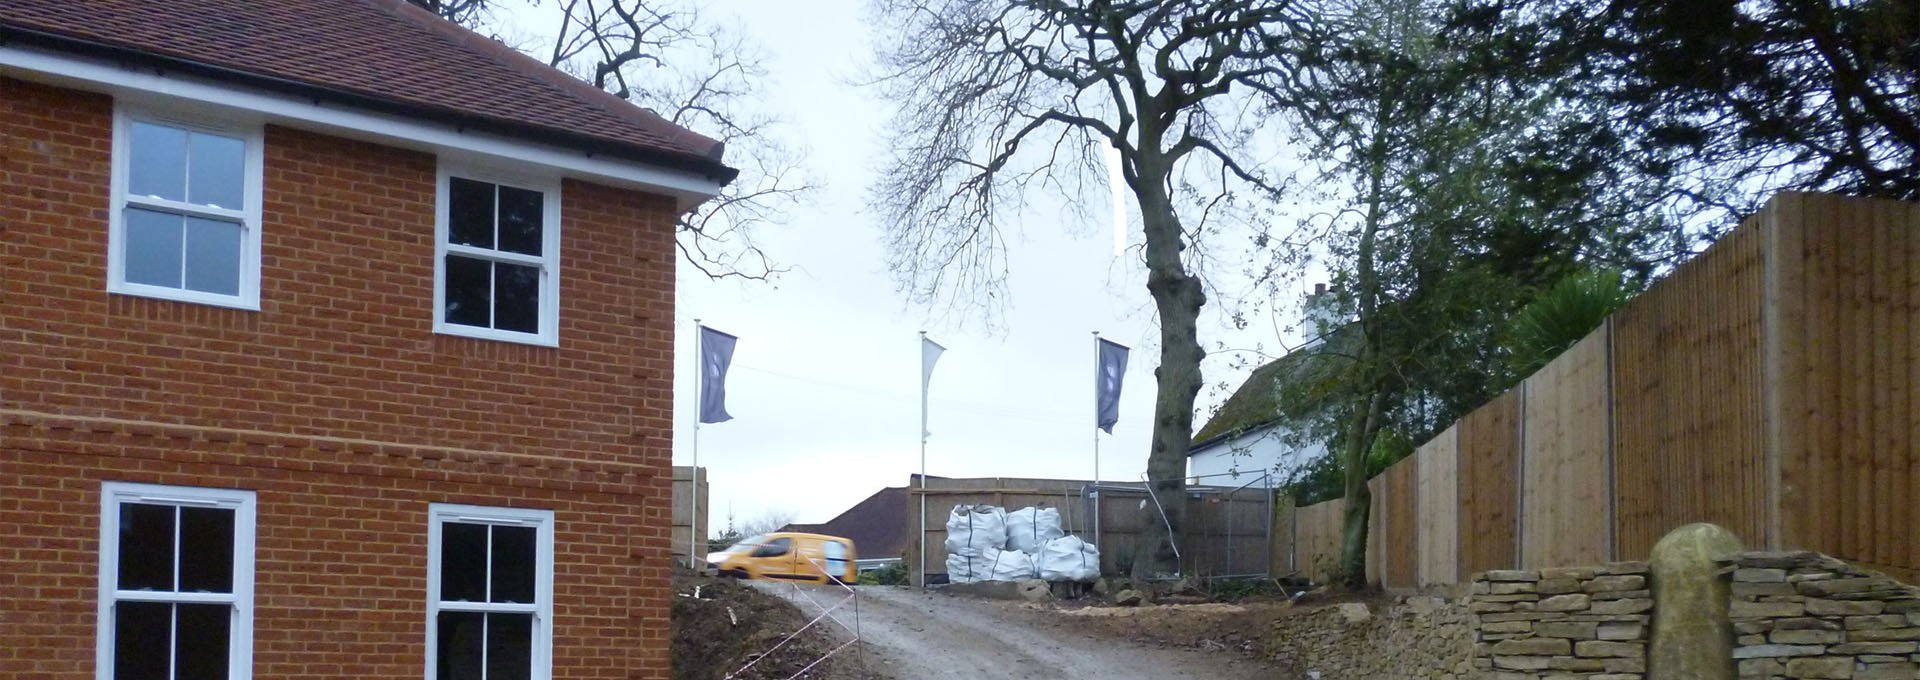 New home in Addlestone Surrey